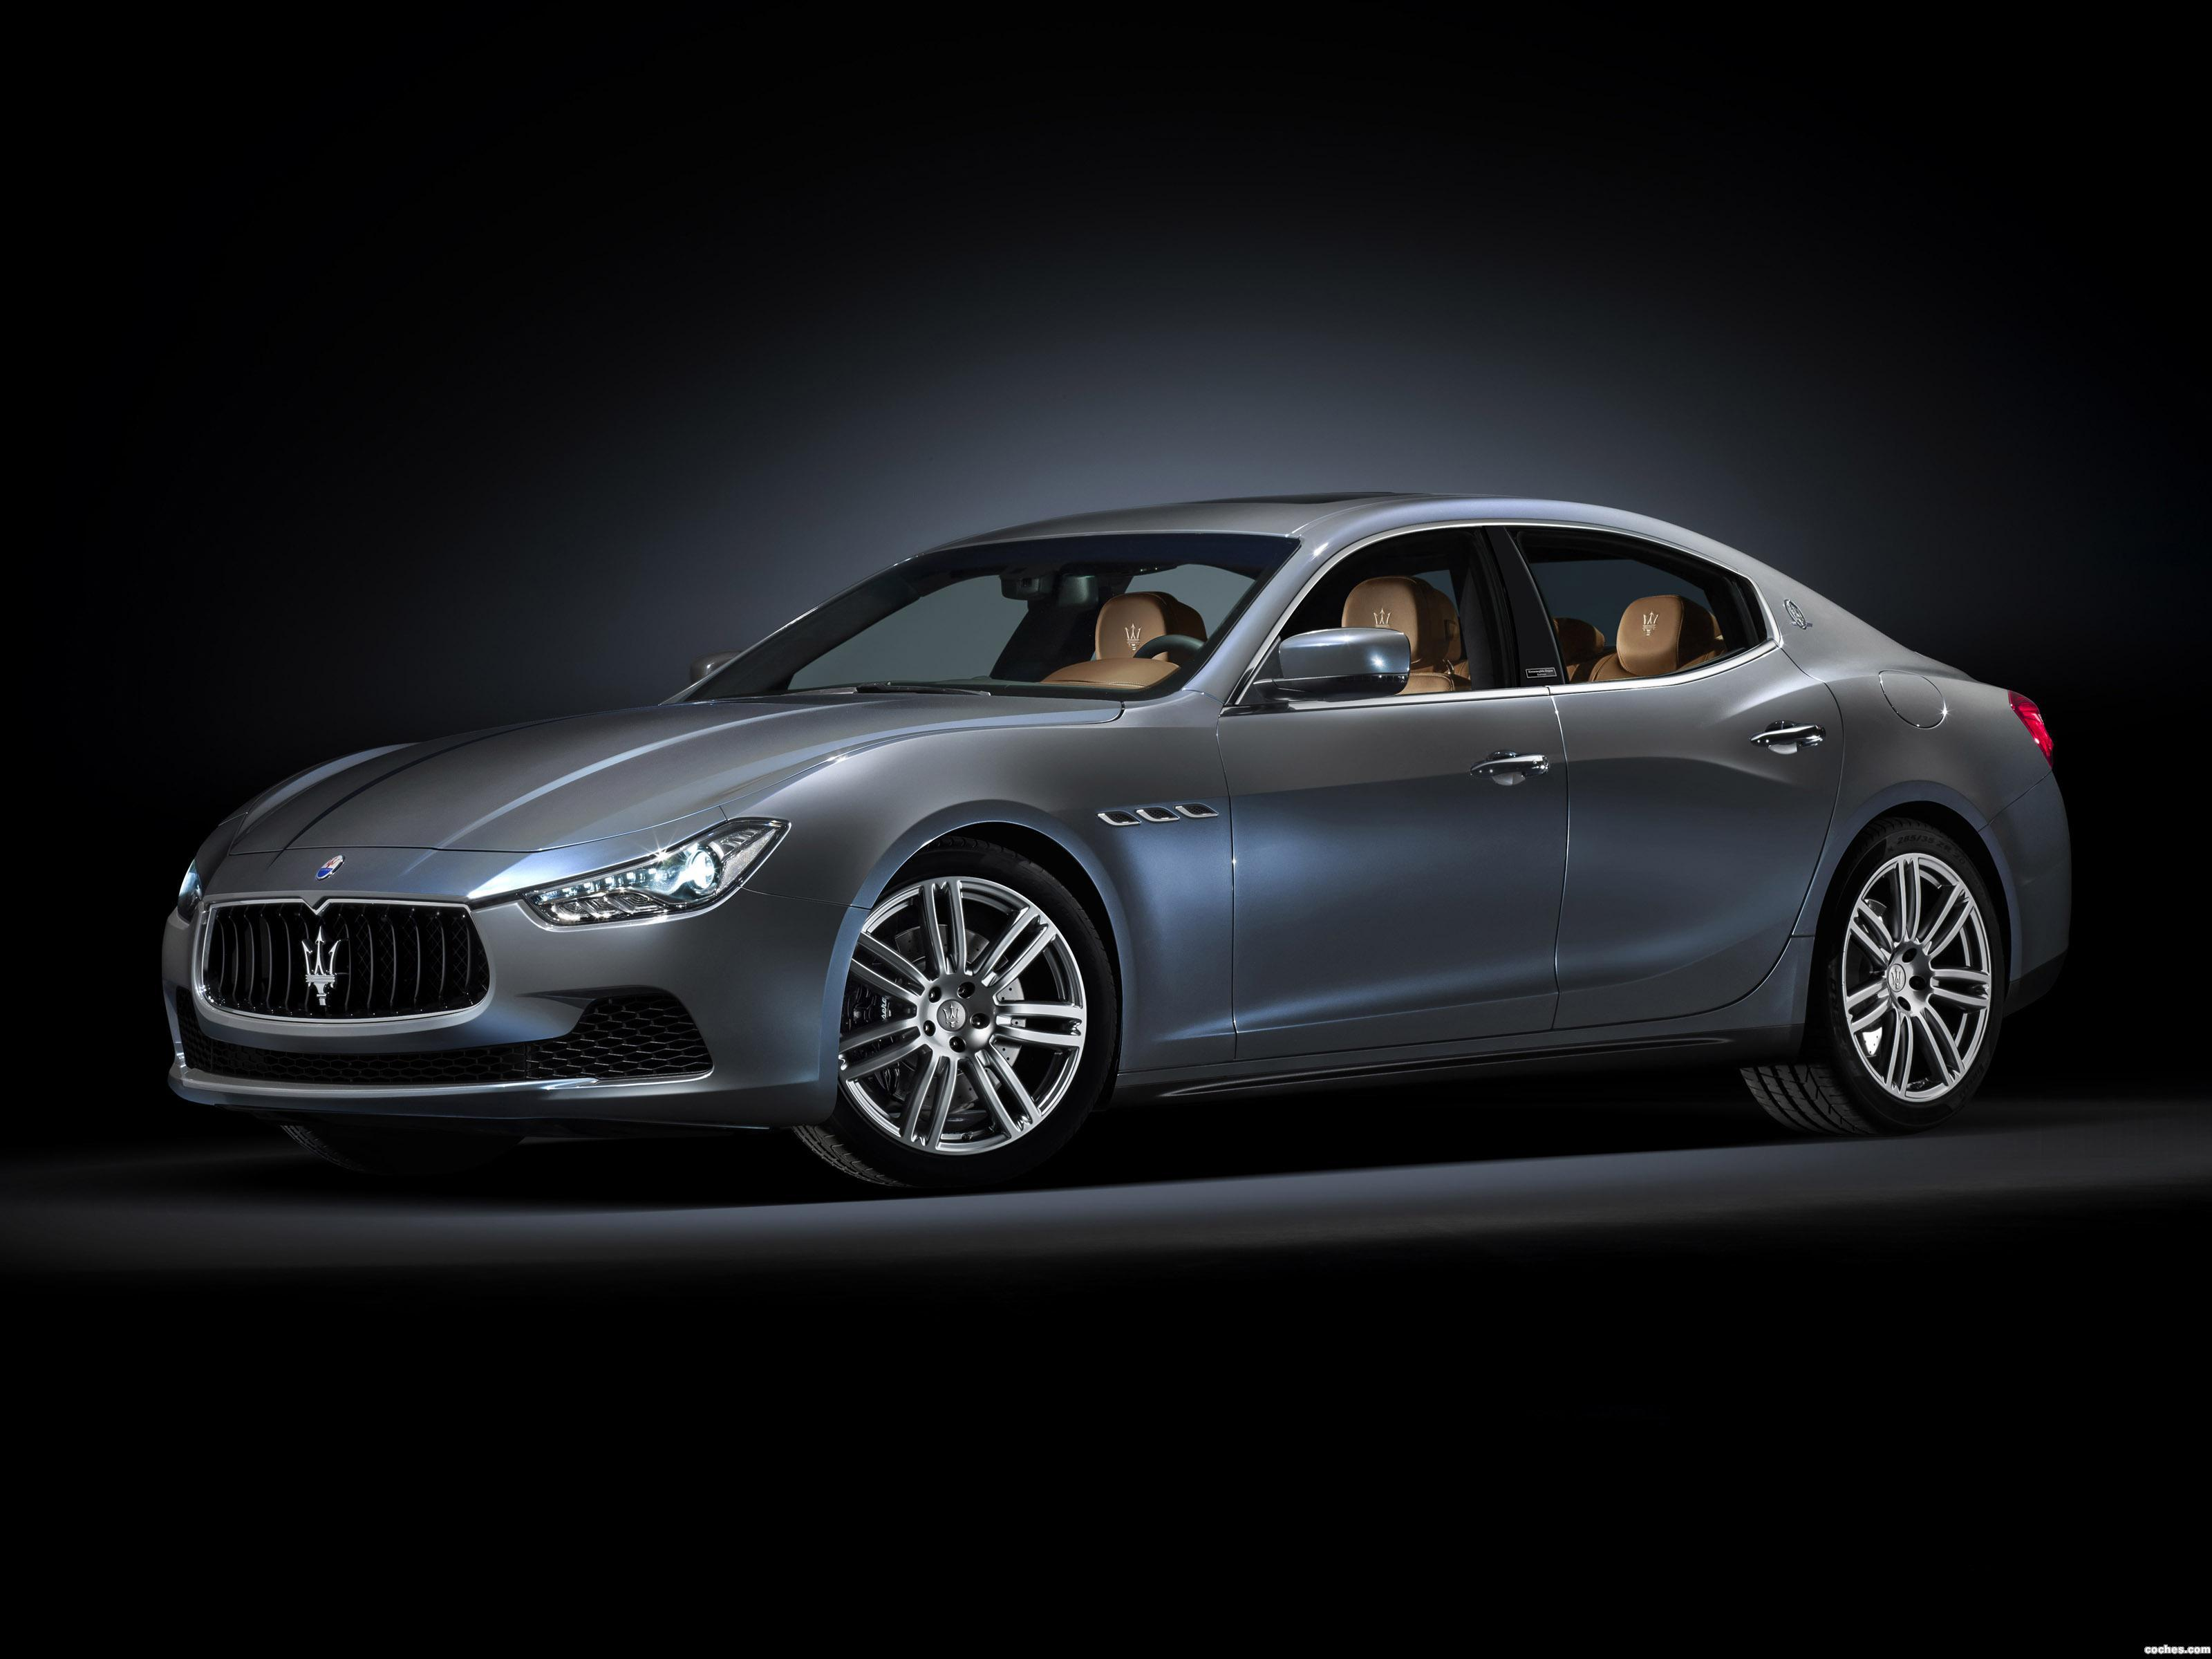 Foto 0 de Maserati Ghibli Ermenegildo Zegna Concept 2014